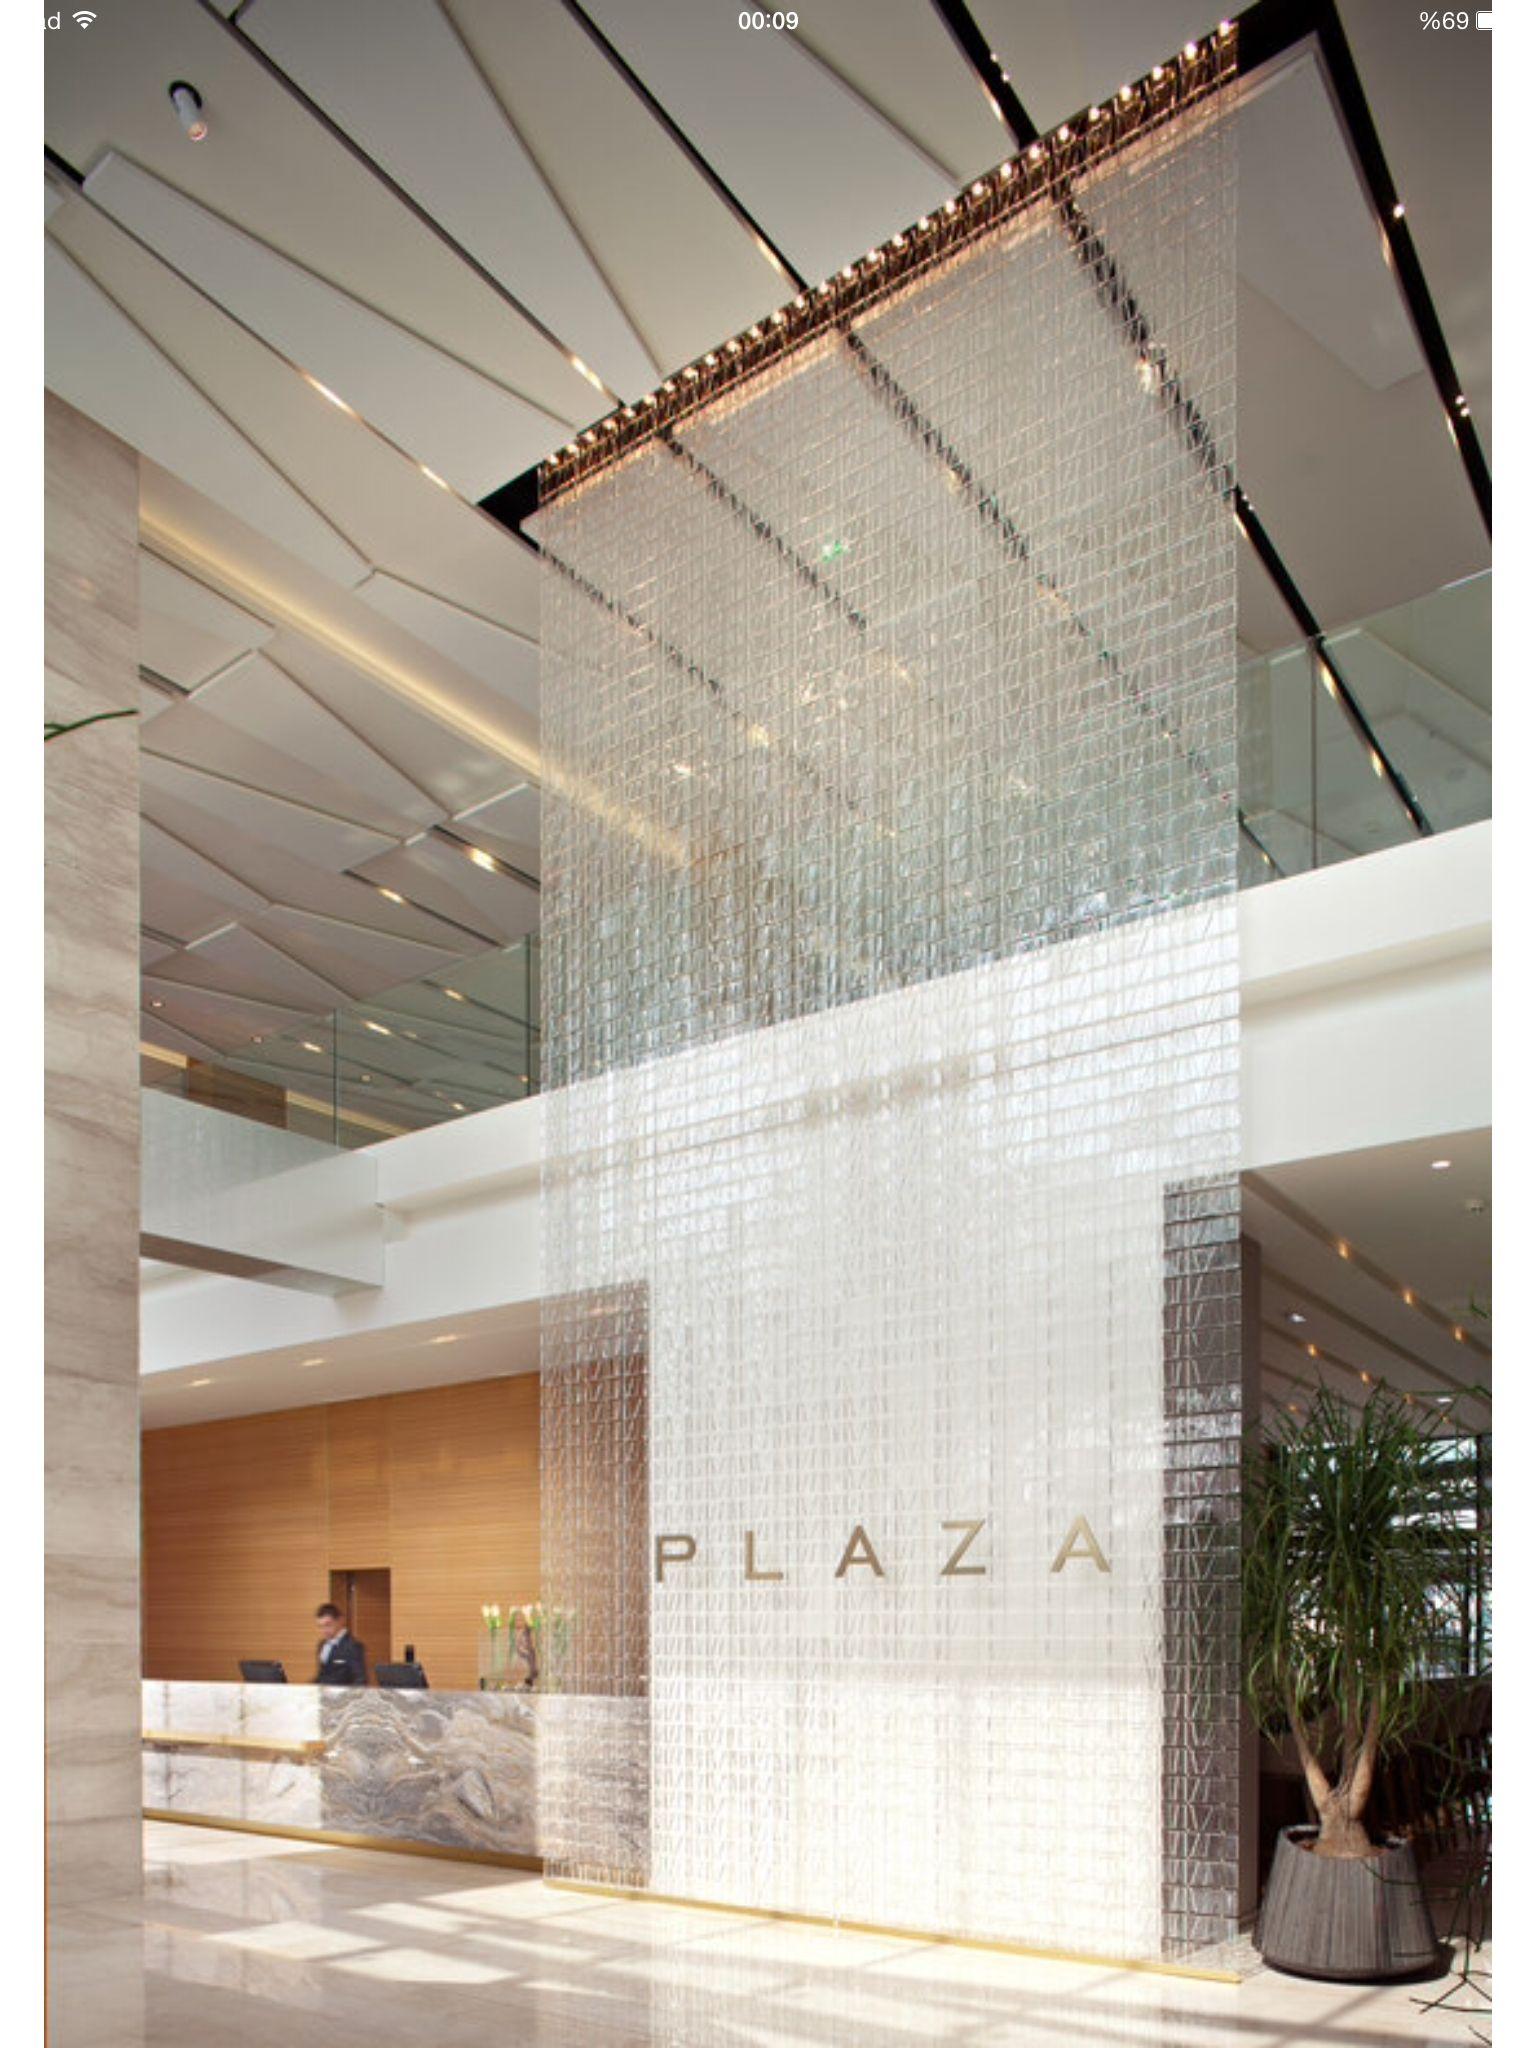 Fabbian illuminazione spa | Lighting Elements | Pinterest | Spa